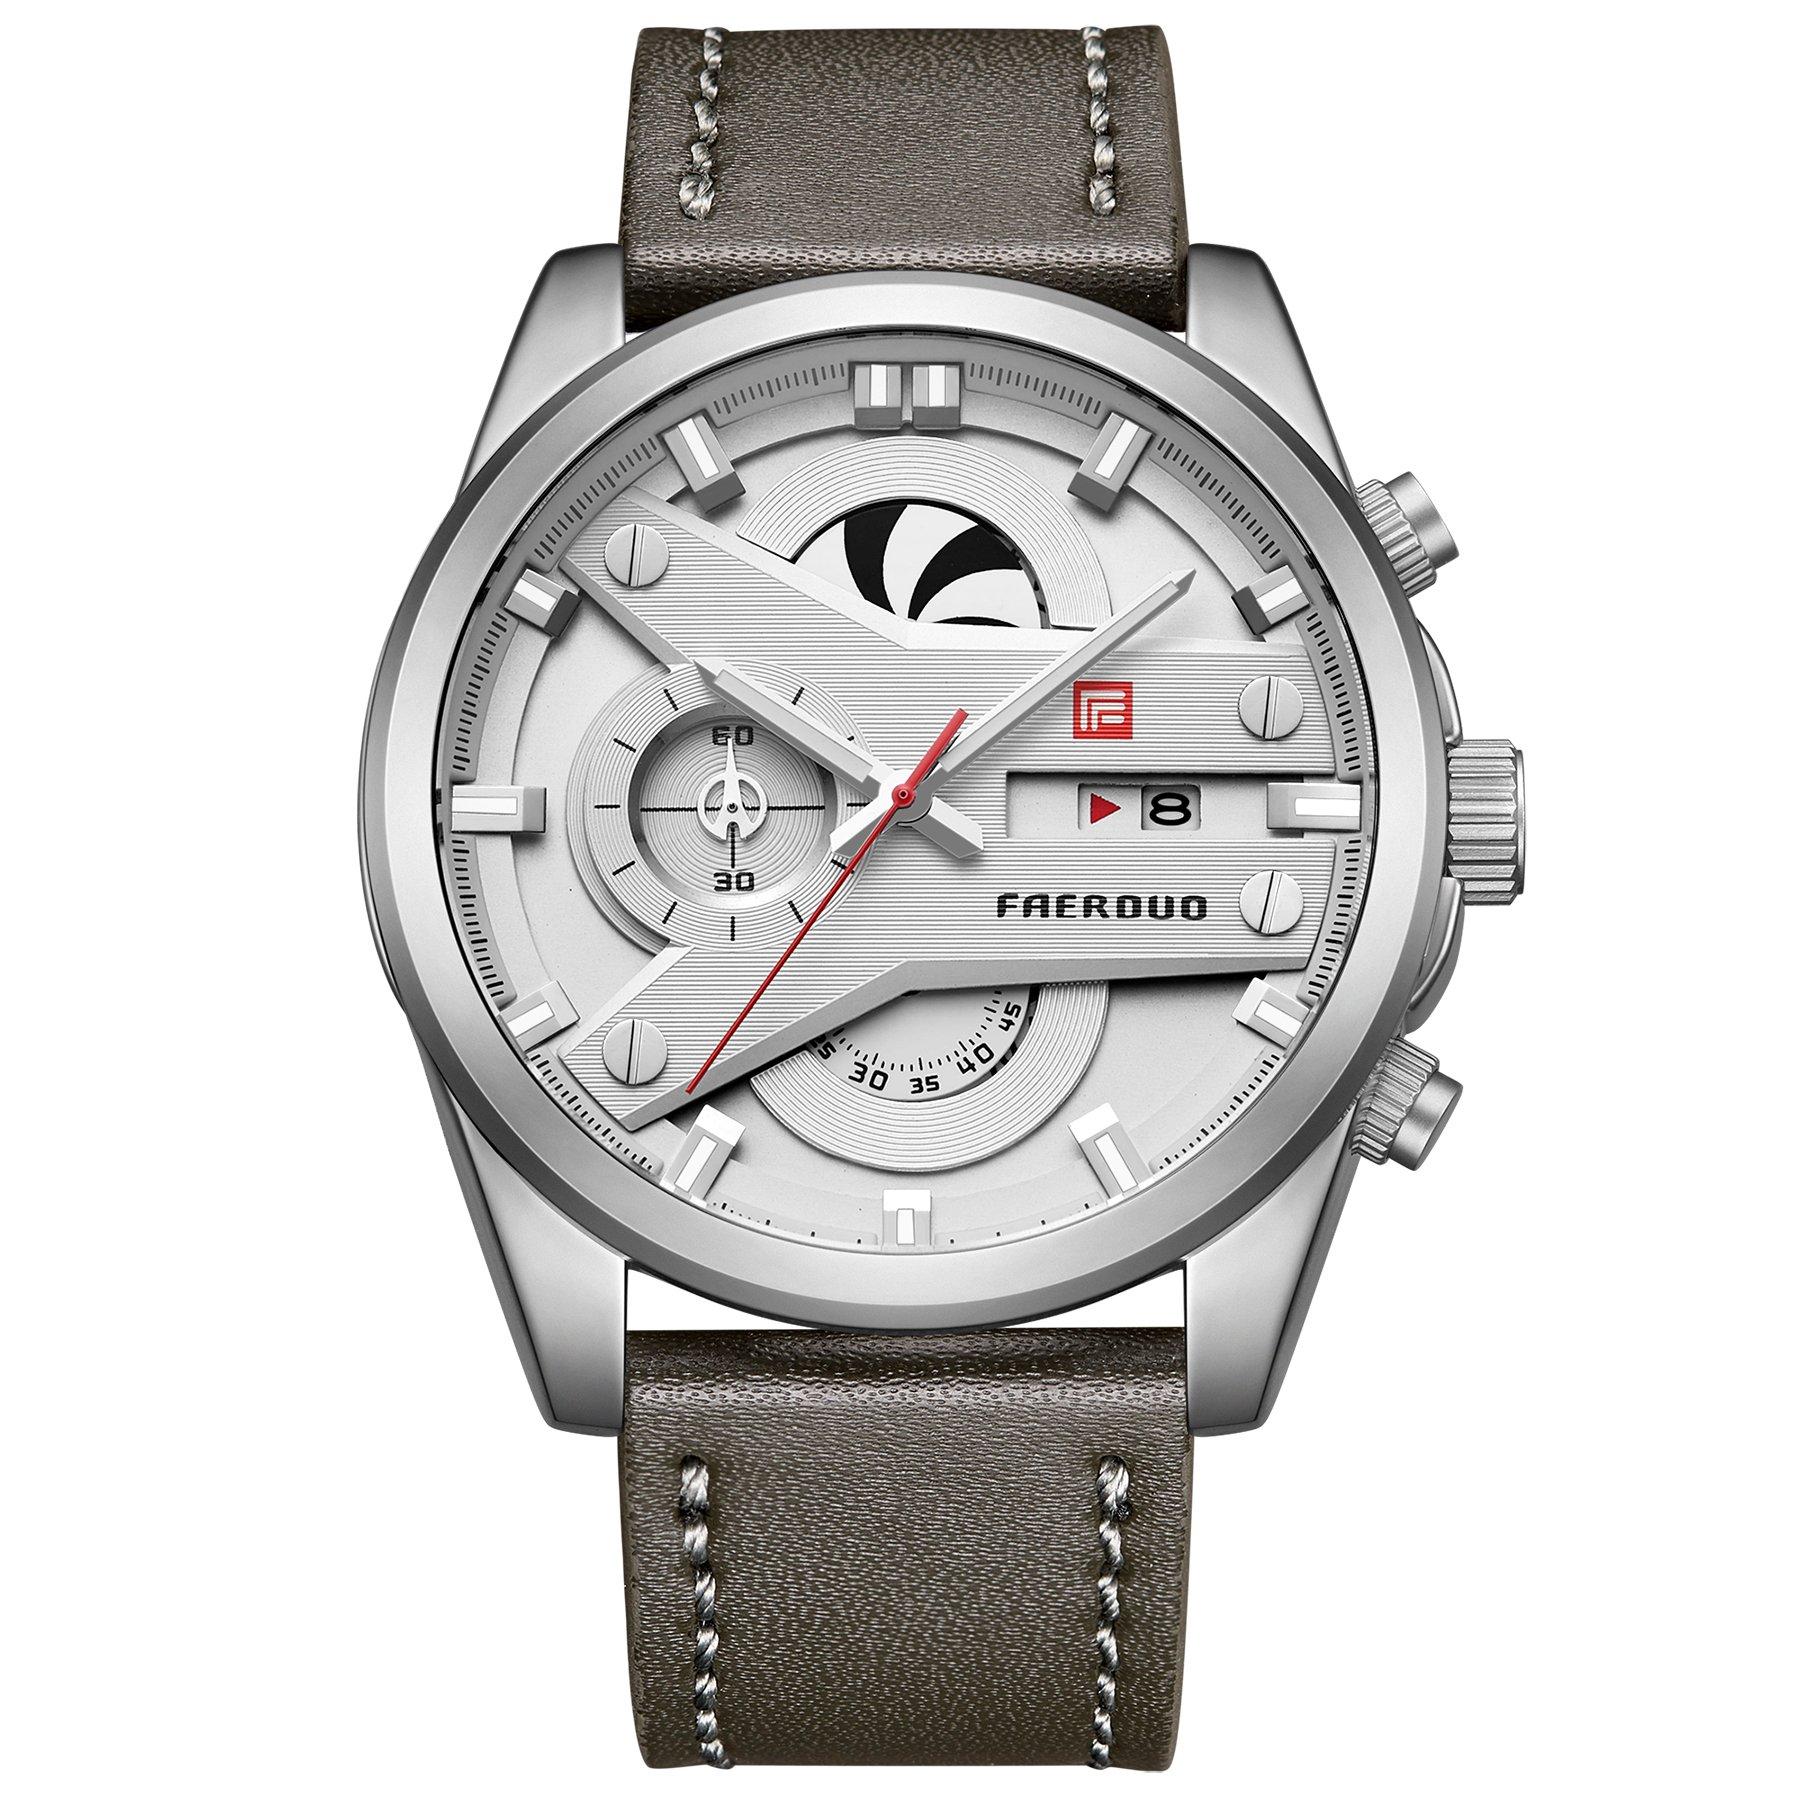 FAERDUO Reloj de los Hombres de Lujo Hombres Reloj Deportivo Ocasional Crongrafo Impermeable Fecha Pantalla Reloj